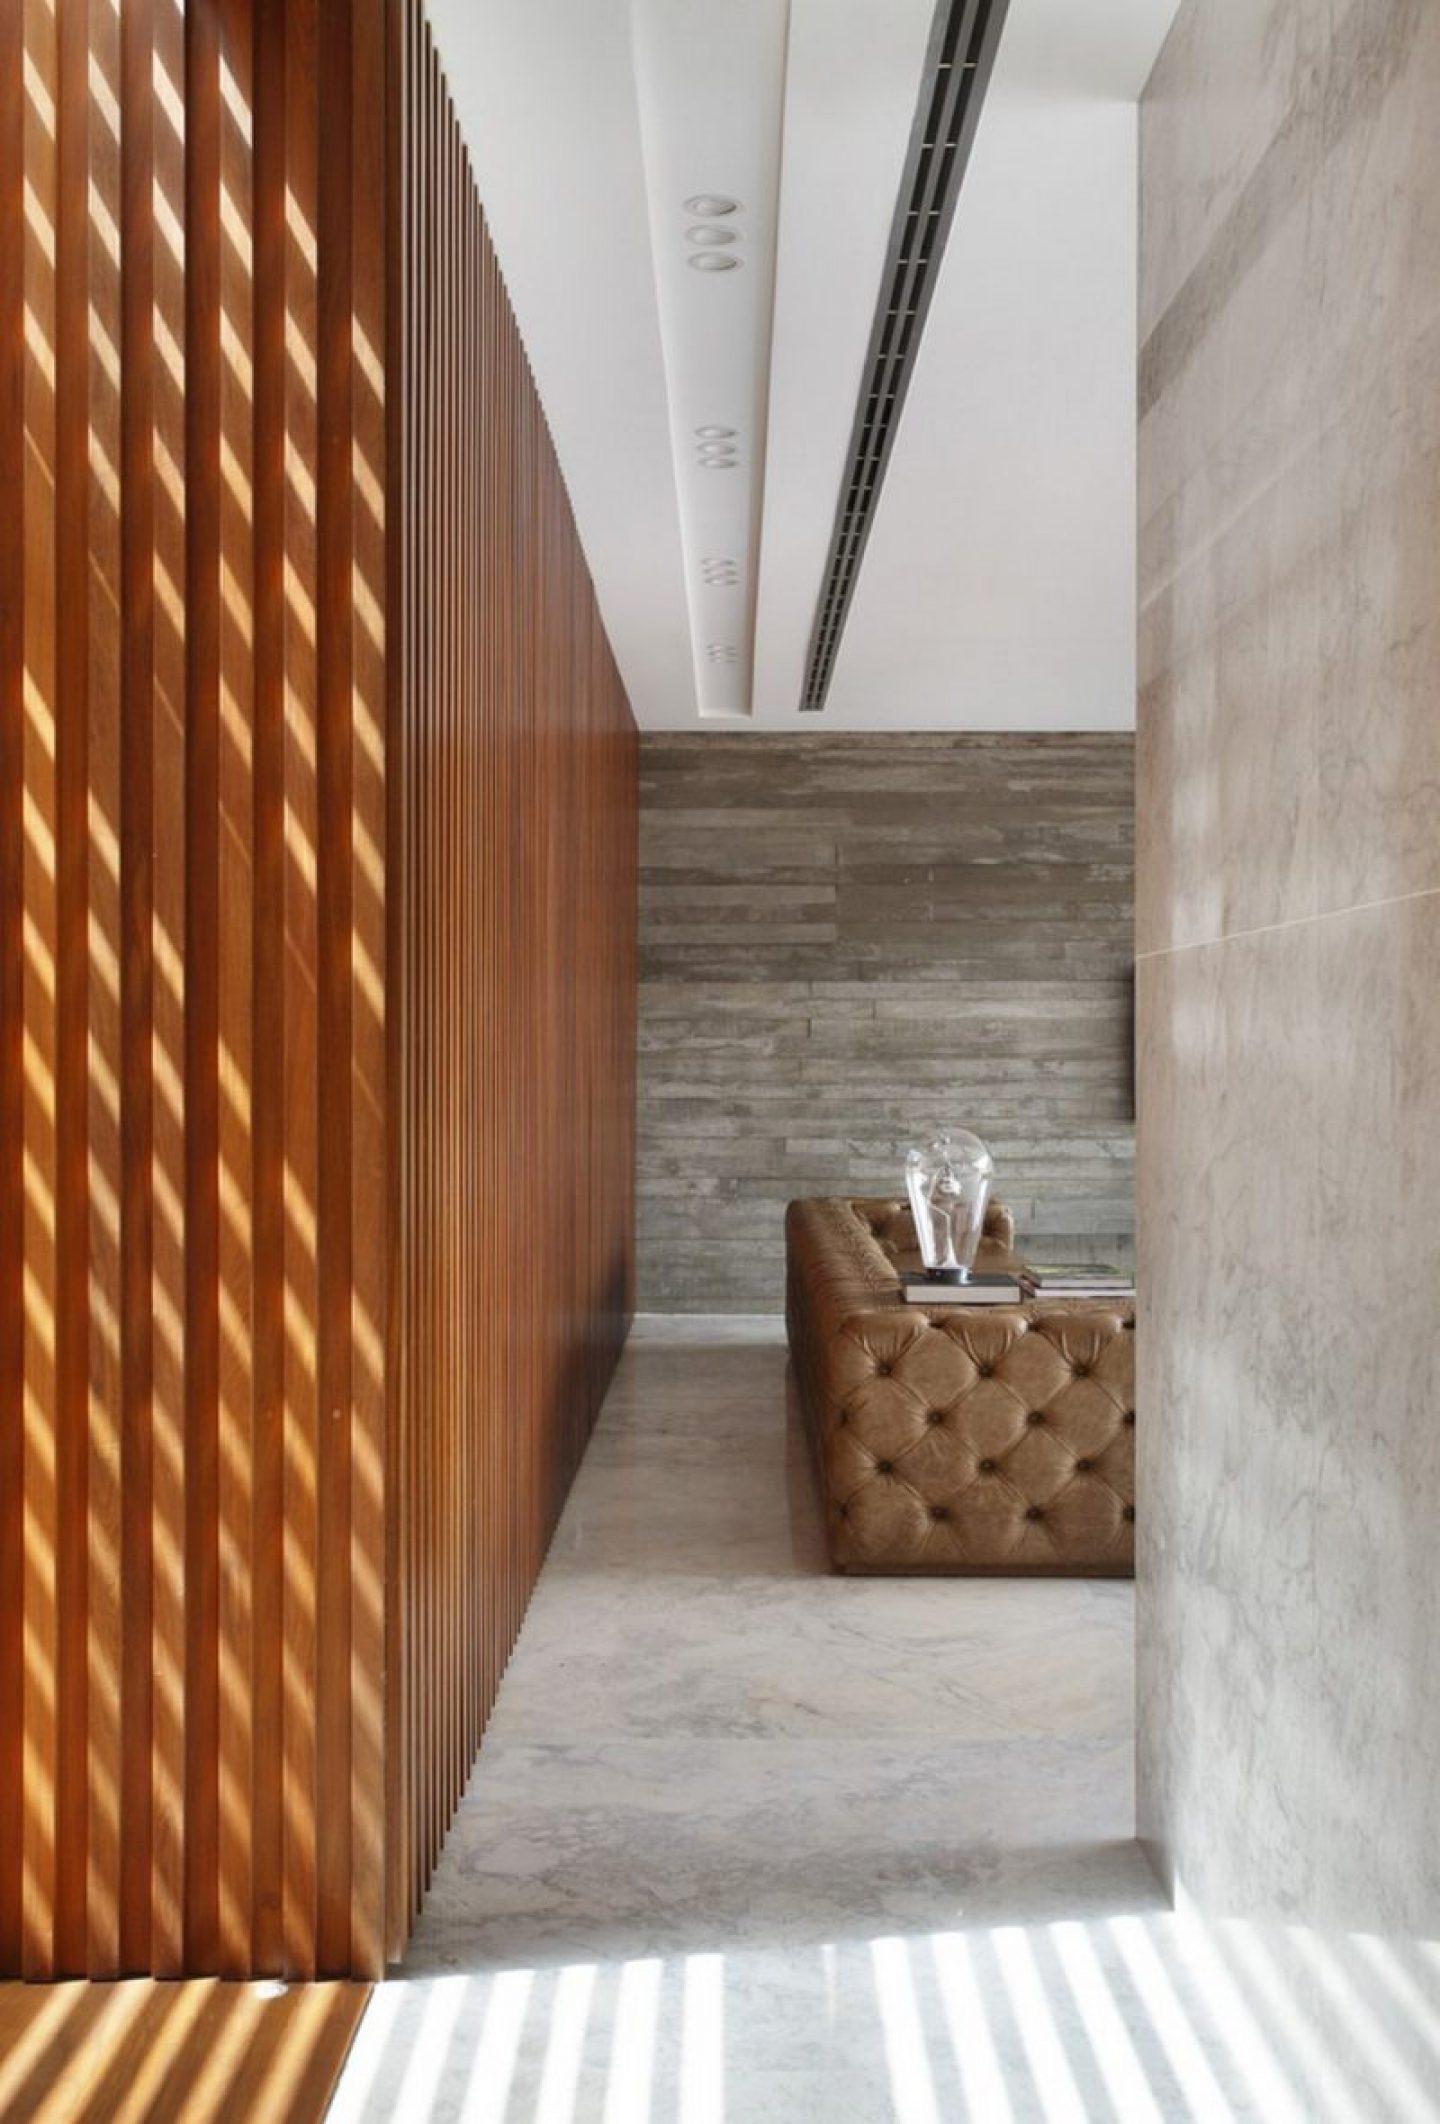 Guilherme_Torres_Architecture (8)